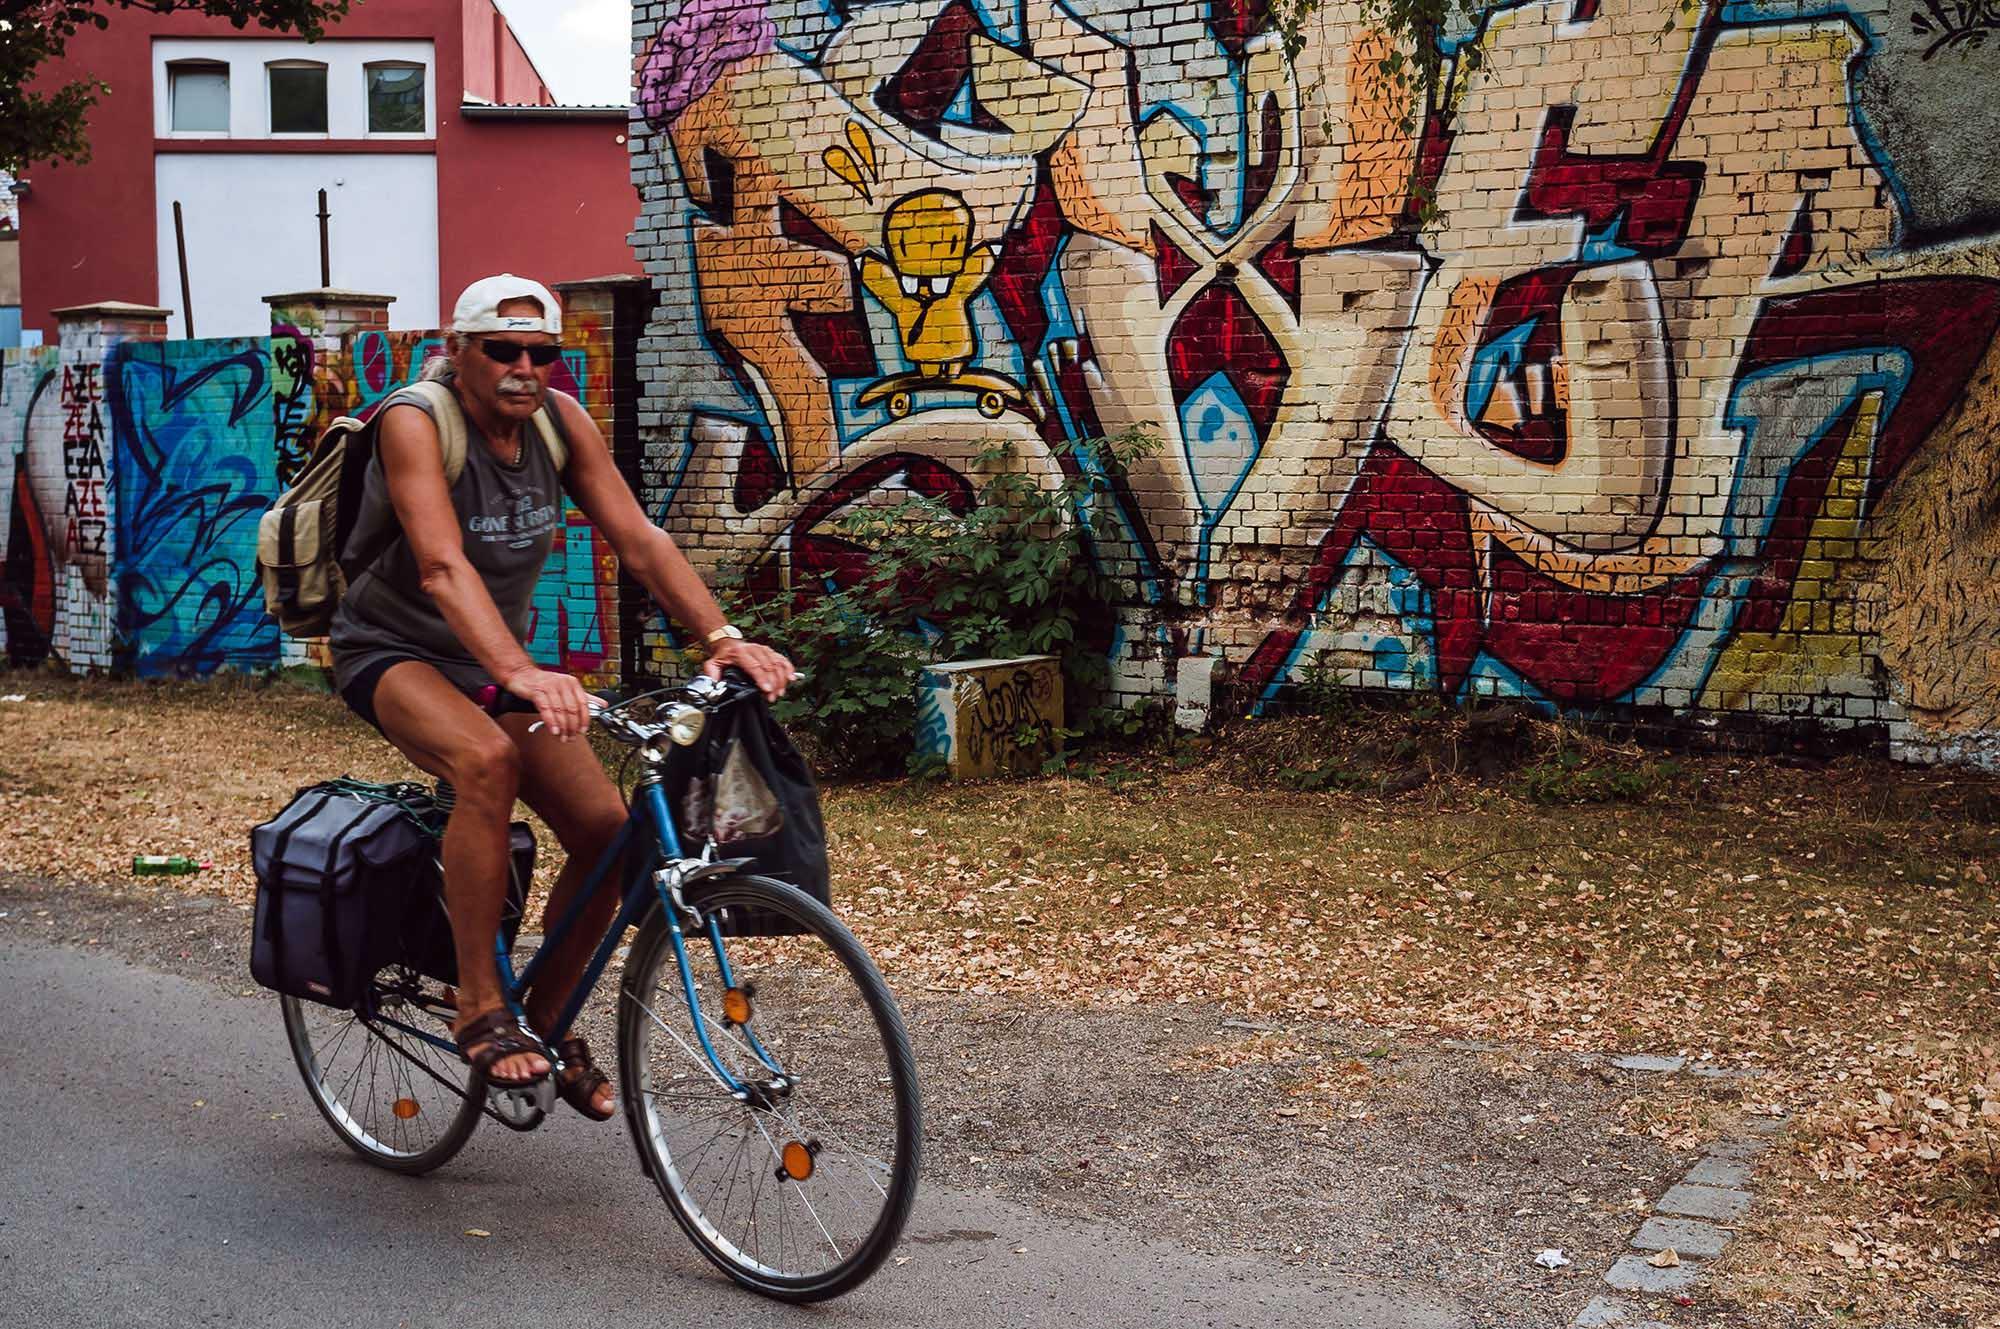 leipzig street photography